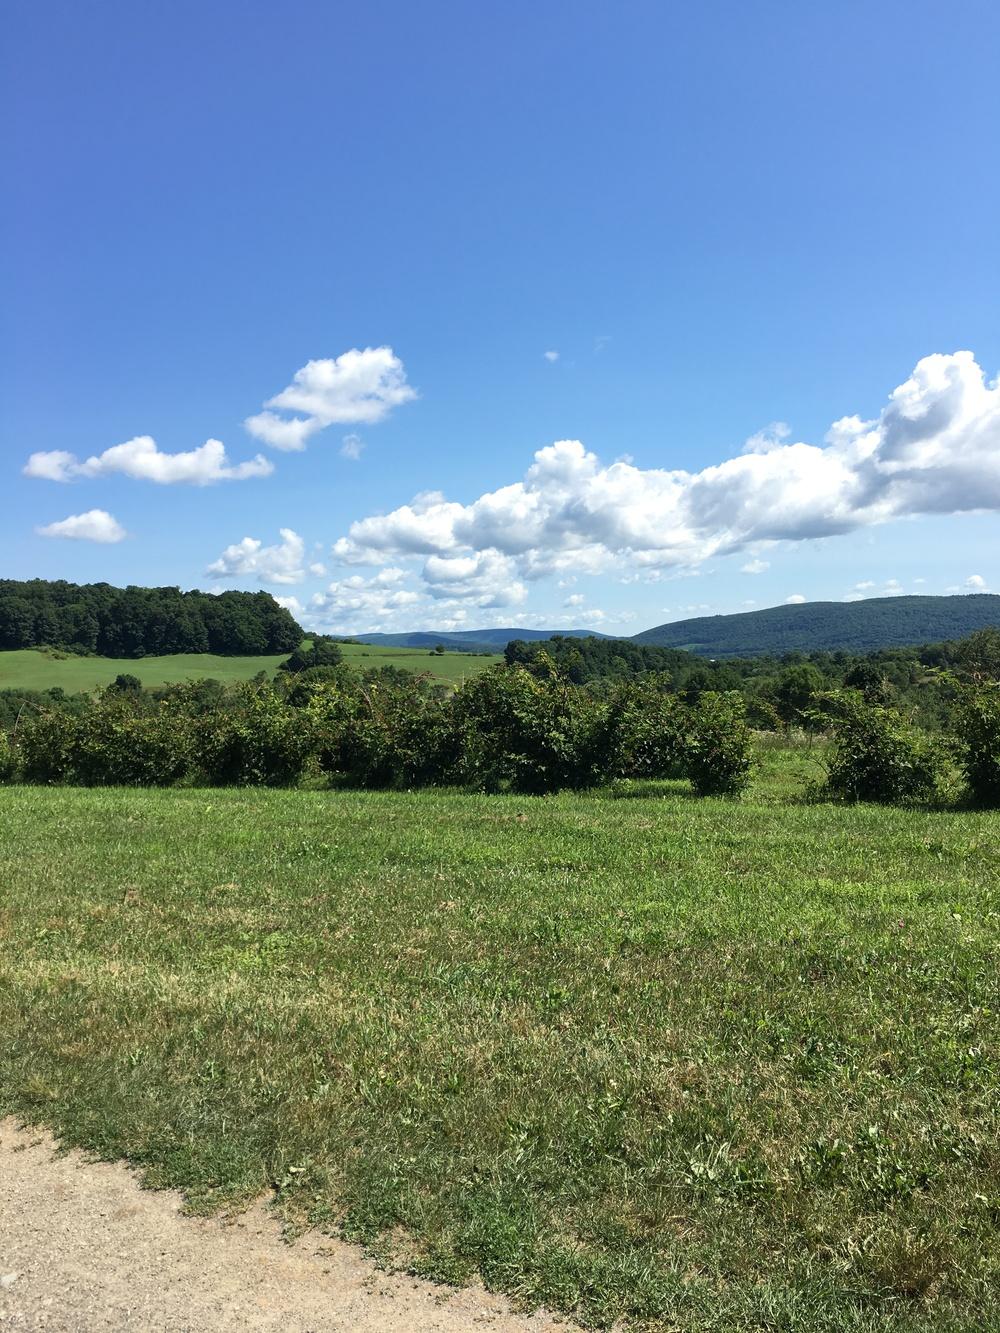 McEnroe Farms is so pretty.